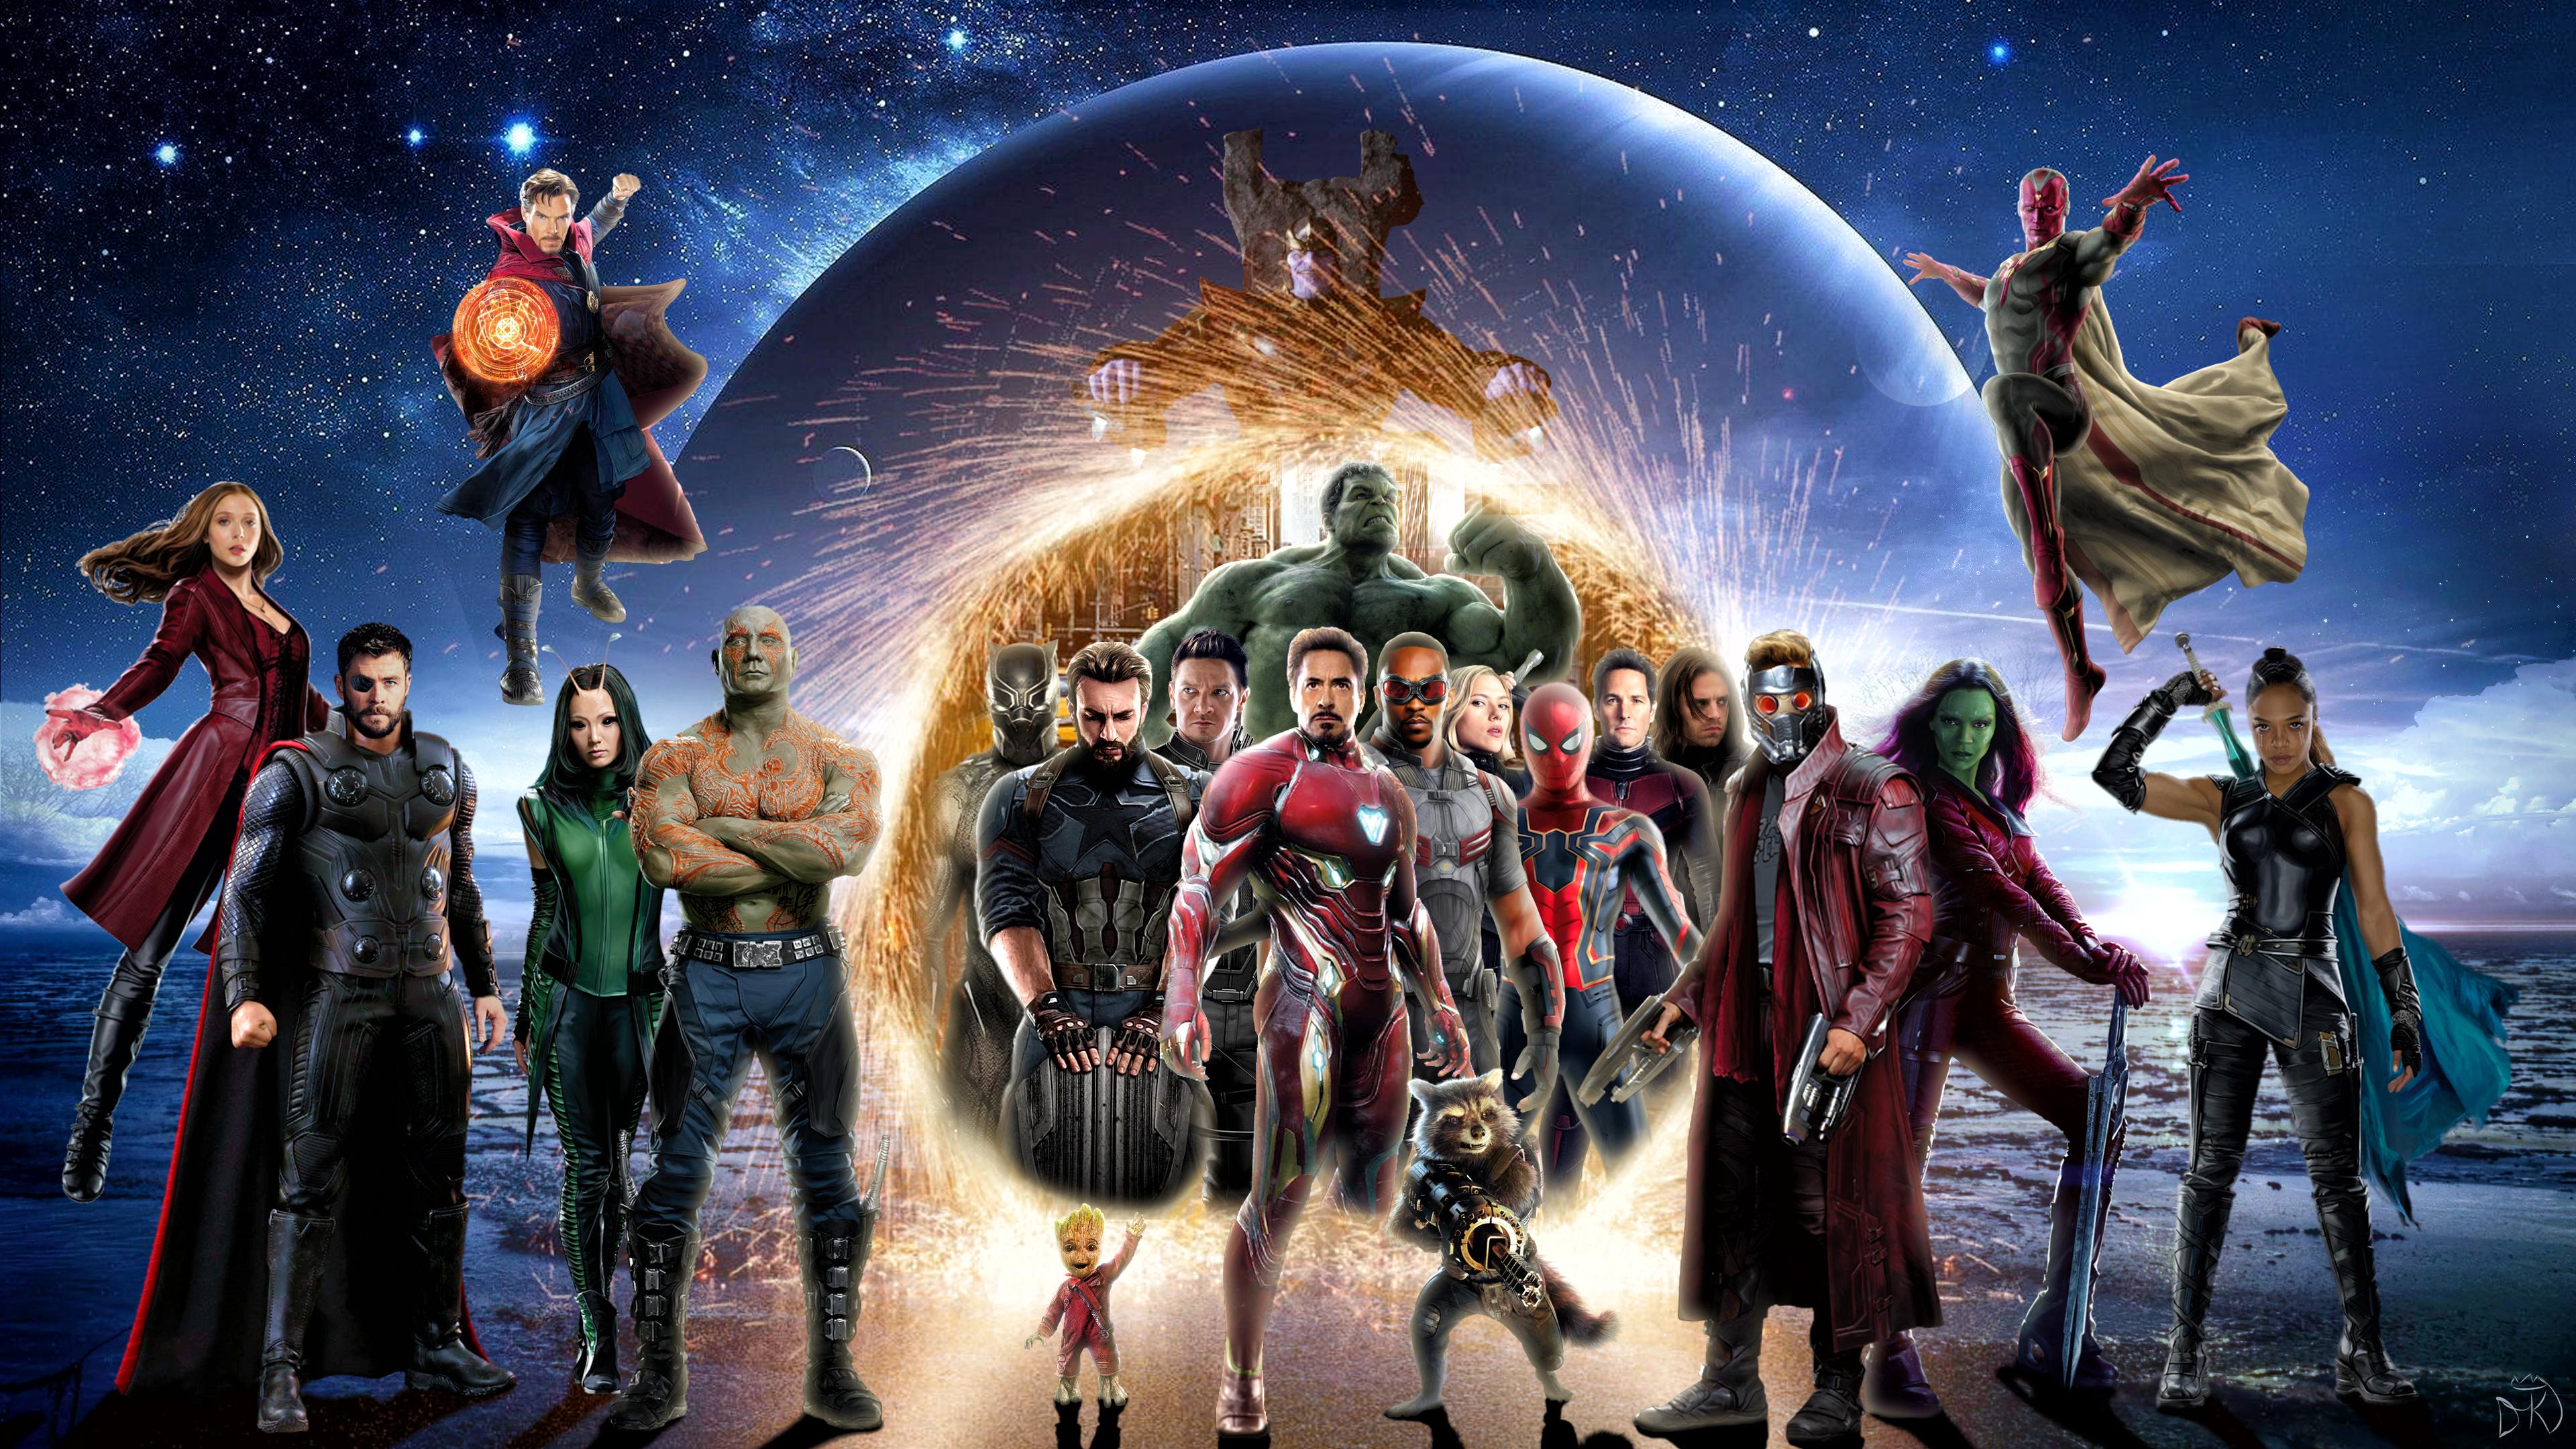 1920x1080 Avengers Infinity War 4k Poster Laptop Full HD